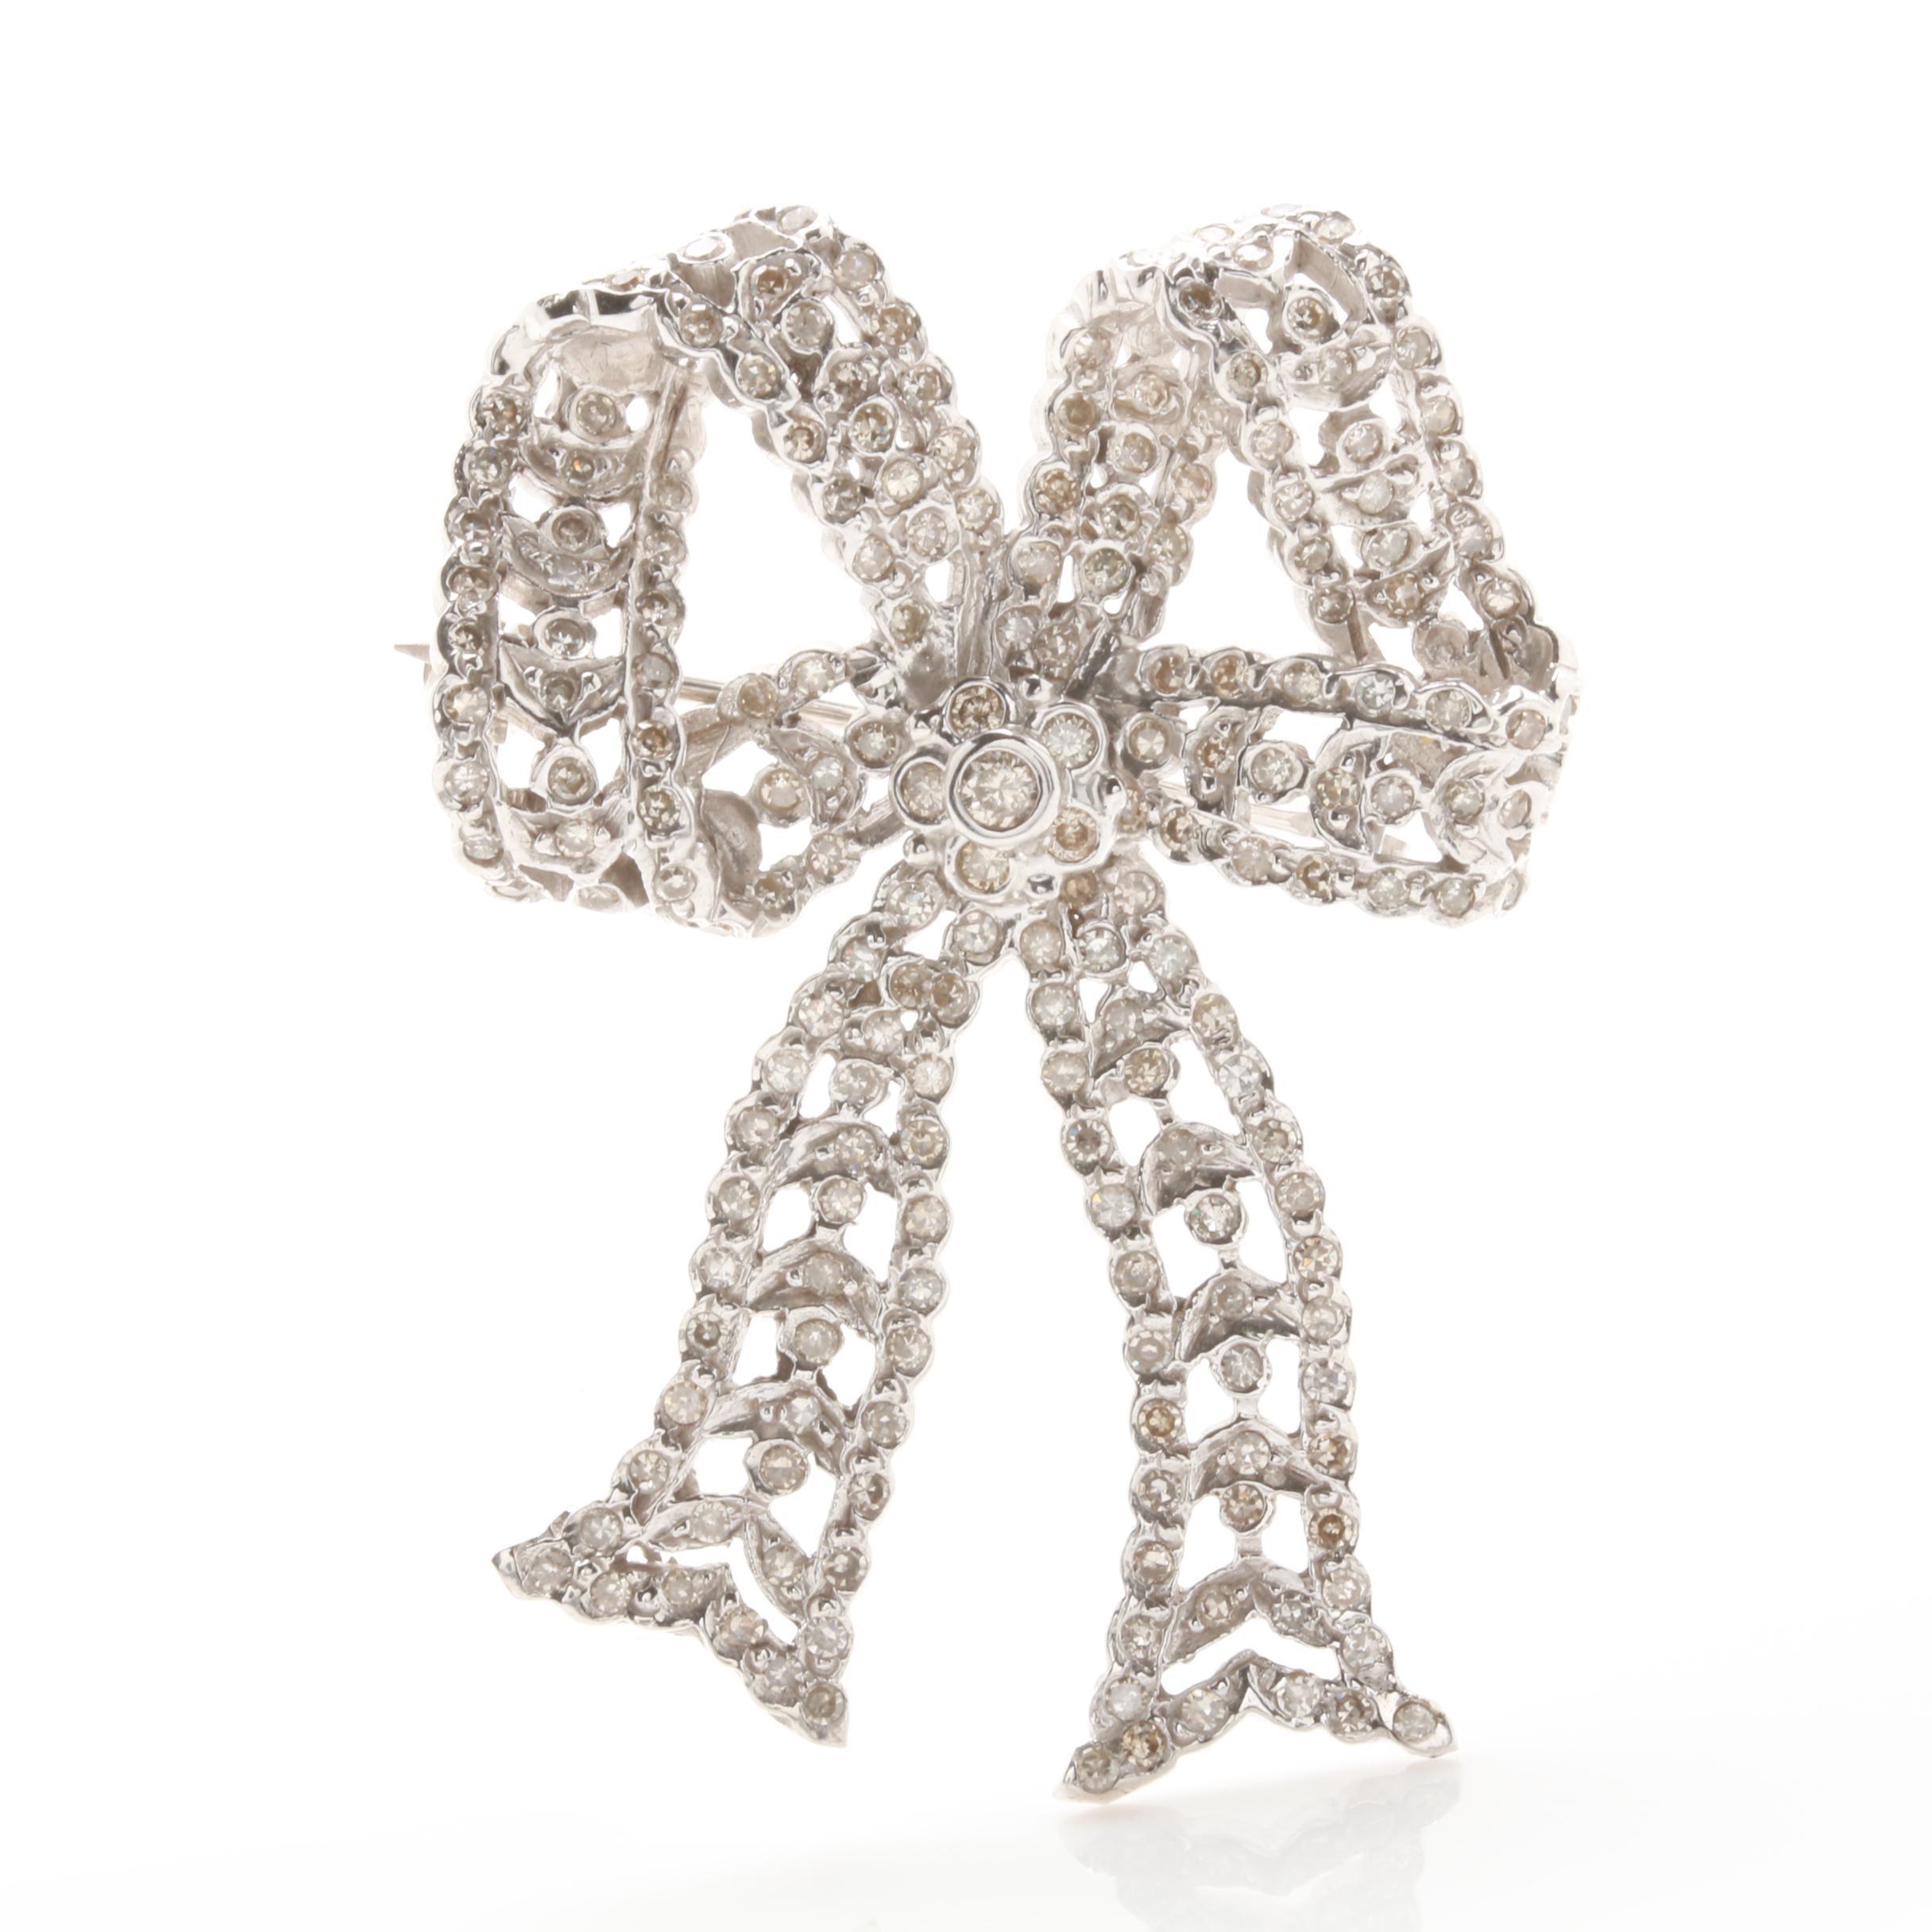 14K White Gold 1.54 CTW Diamond Bow Brooch